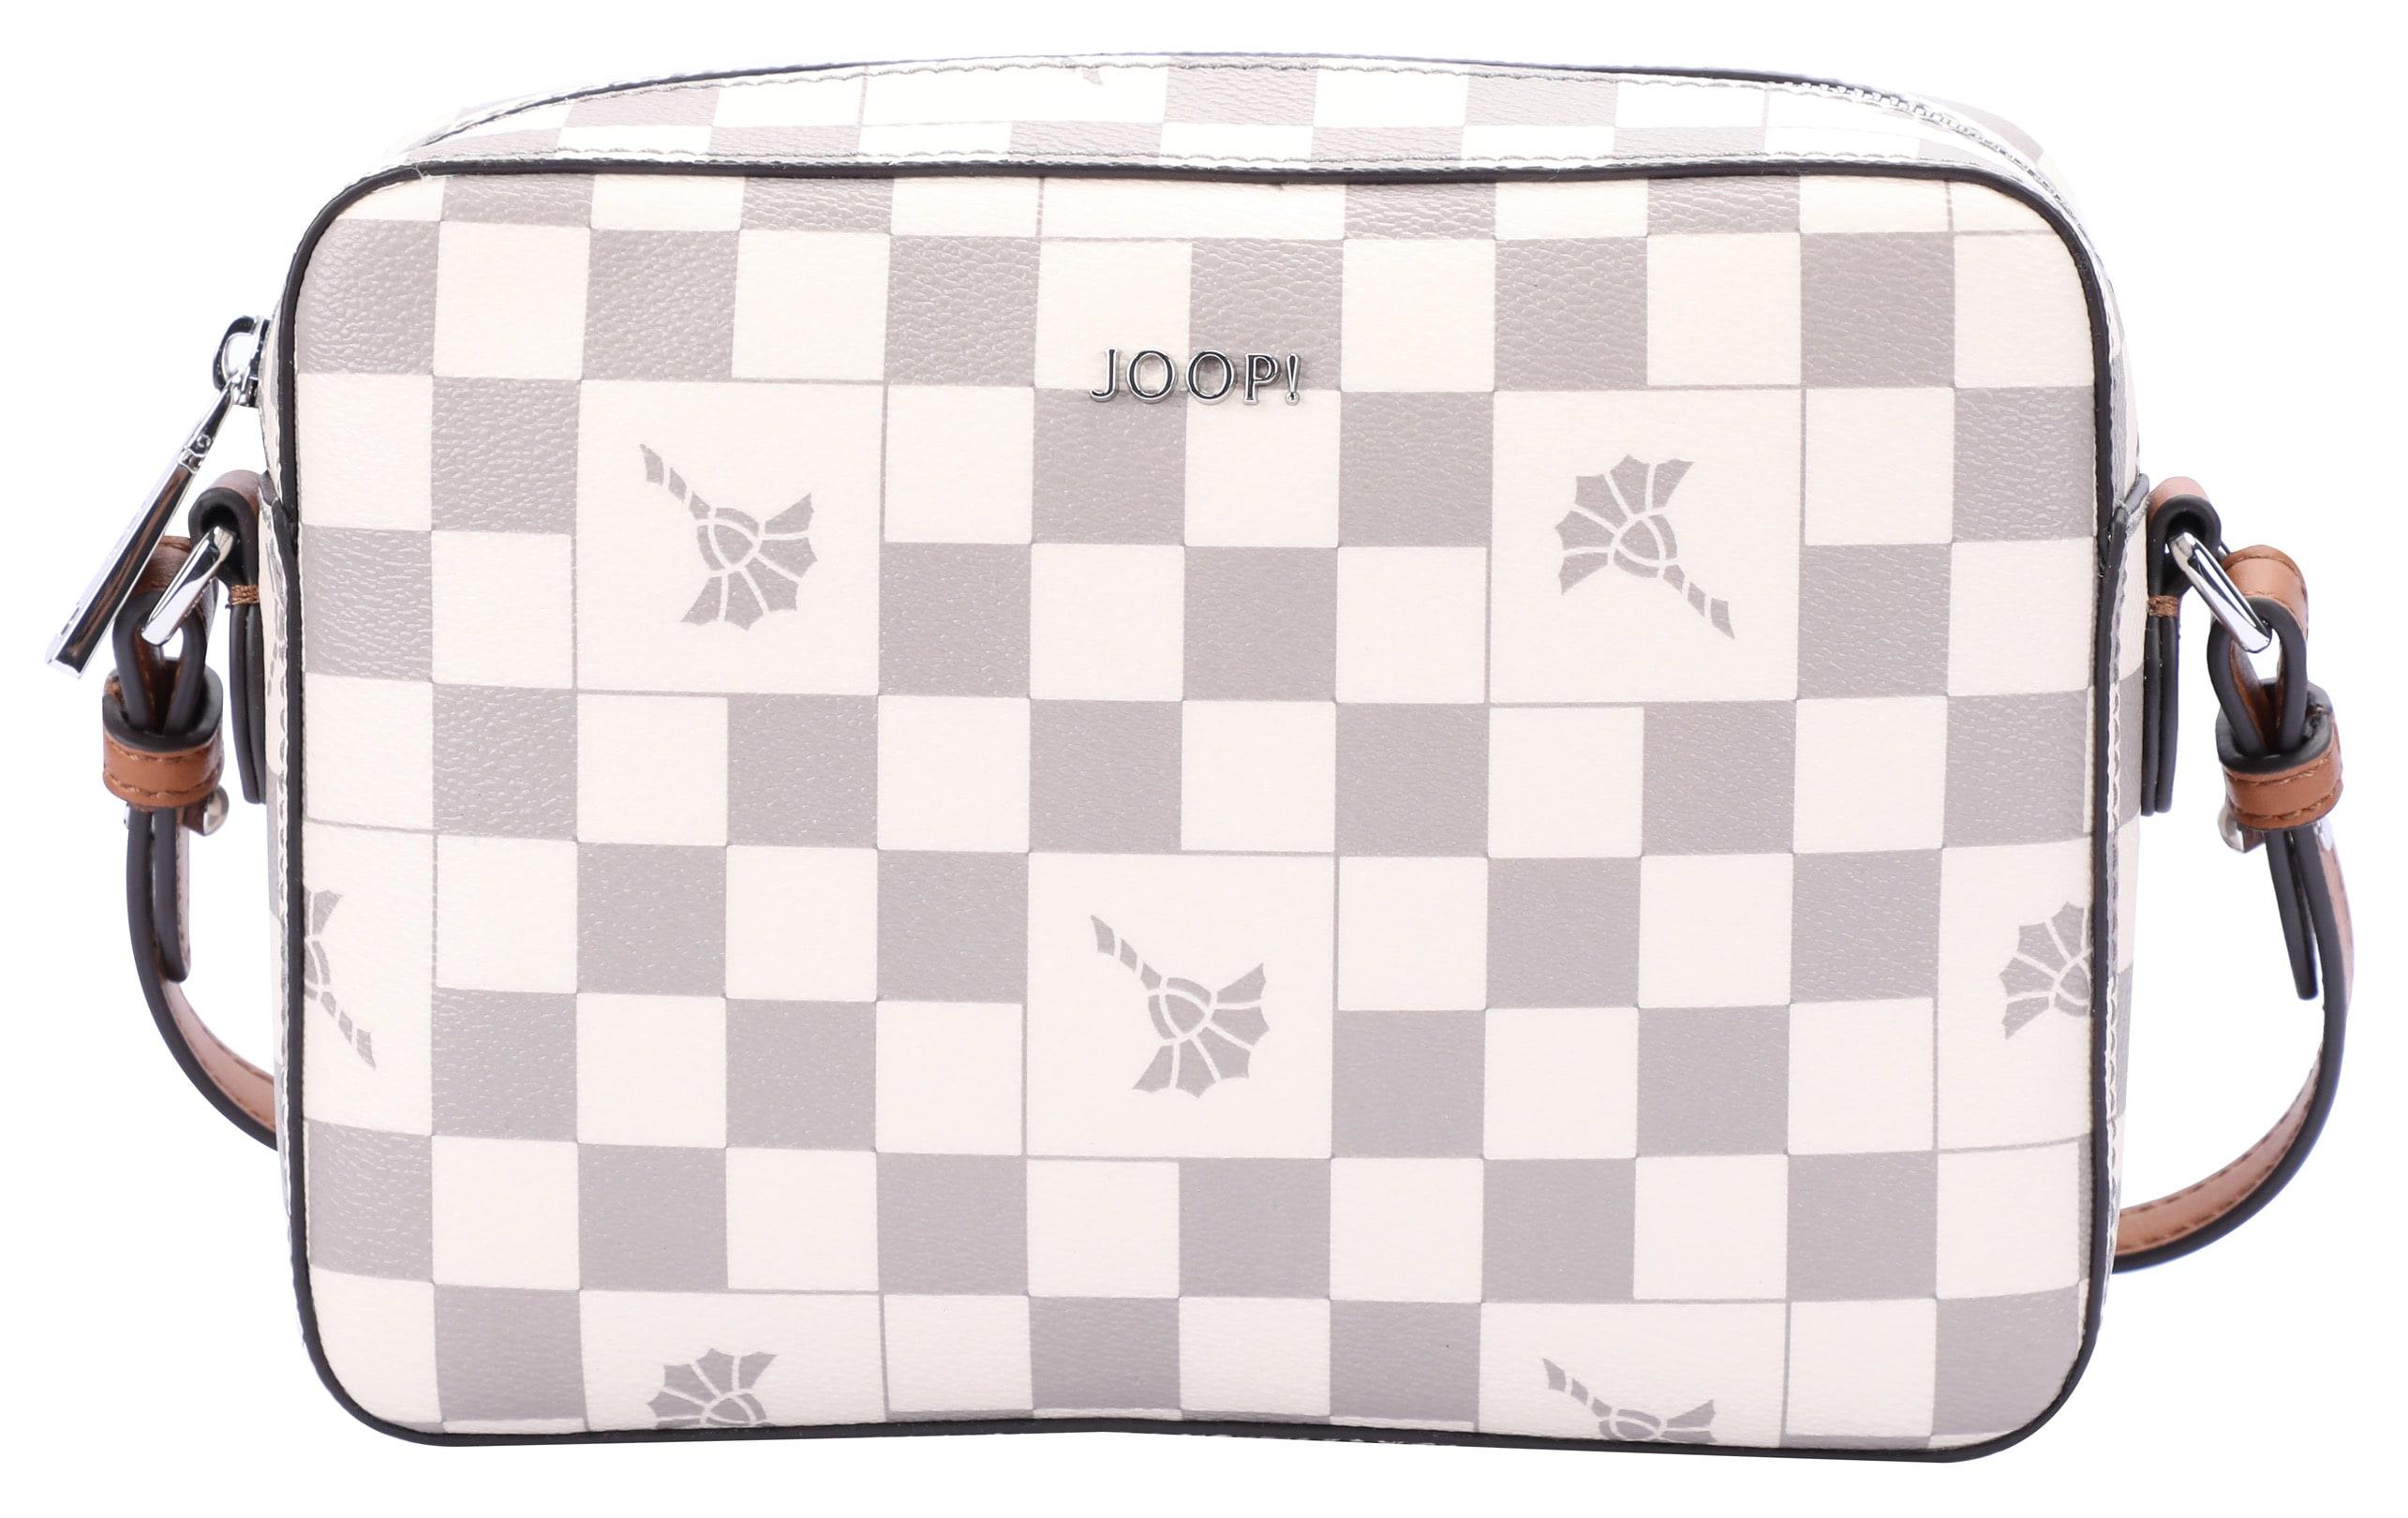 joop! - Joop Umhängetasche cortina piazza cloe shoulderbag shz, mit All Over Print